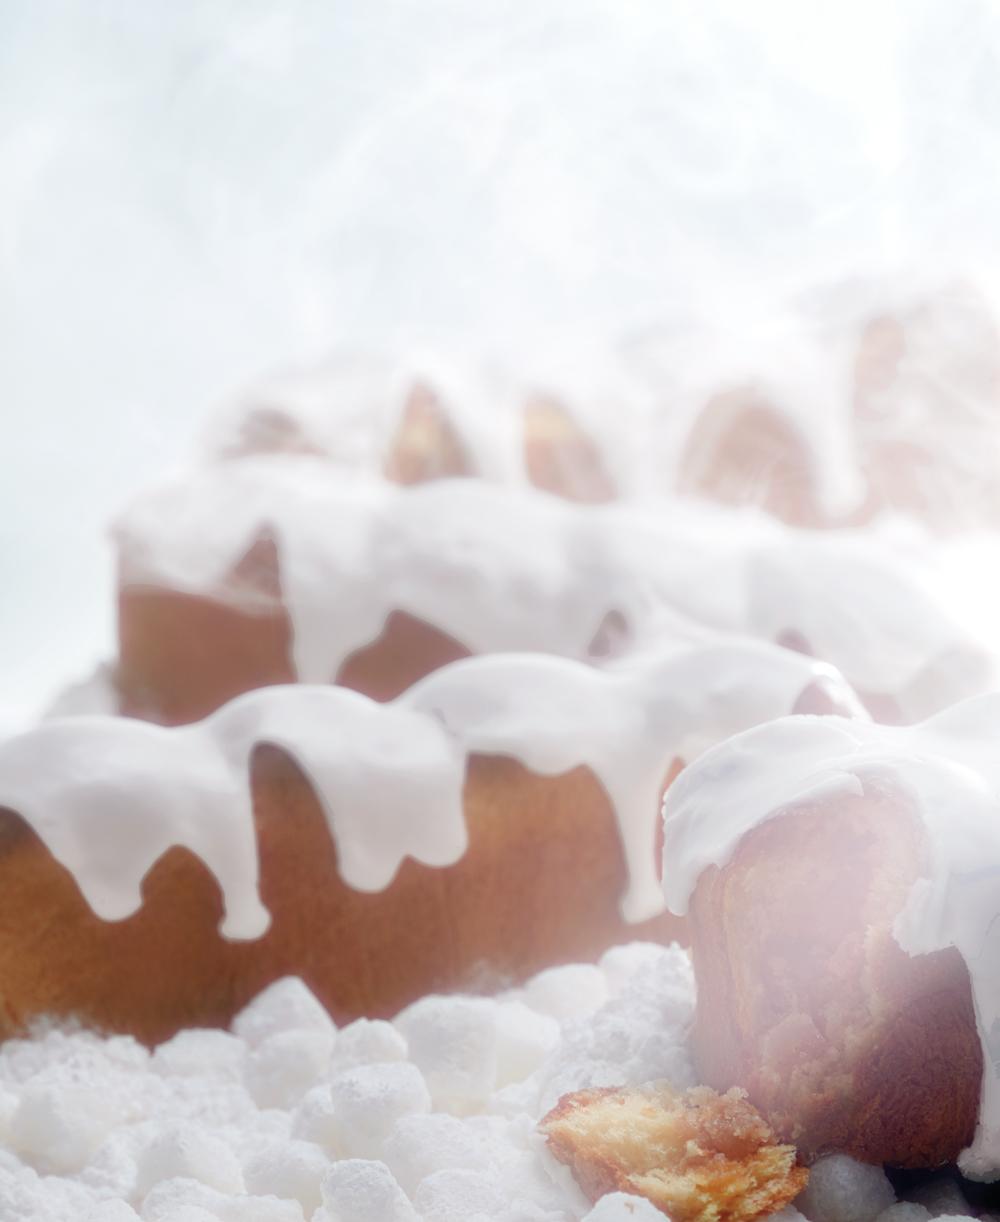 Craquelin (Brioche with Sugar Cubes), Martha Stewart Living